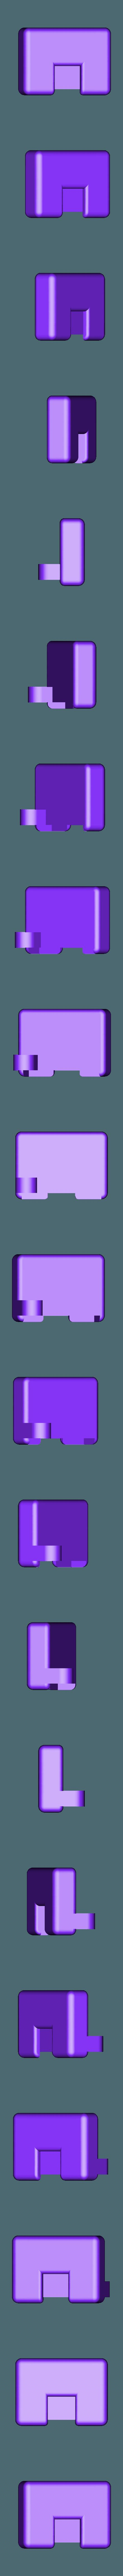 Raspberry_pi_Camera_Mount2.stl Download free STL file Raspberry Pi Camera Mount(V1.3) • Model to 3D print, necobut